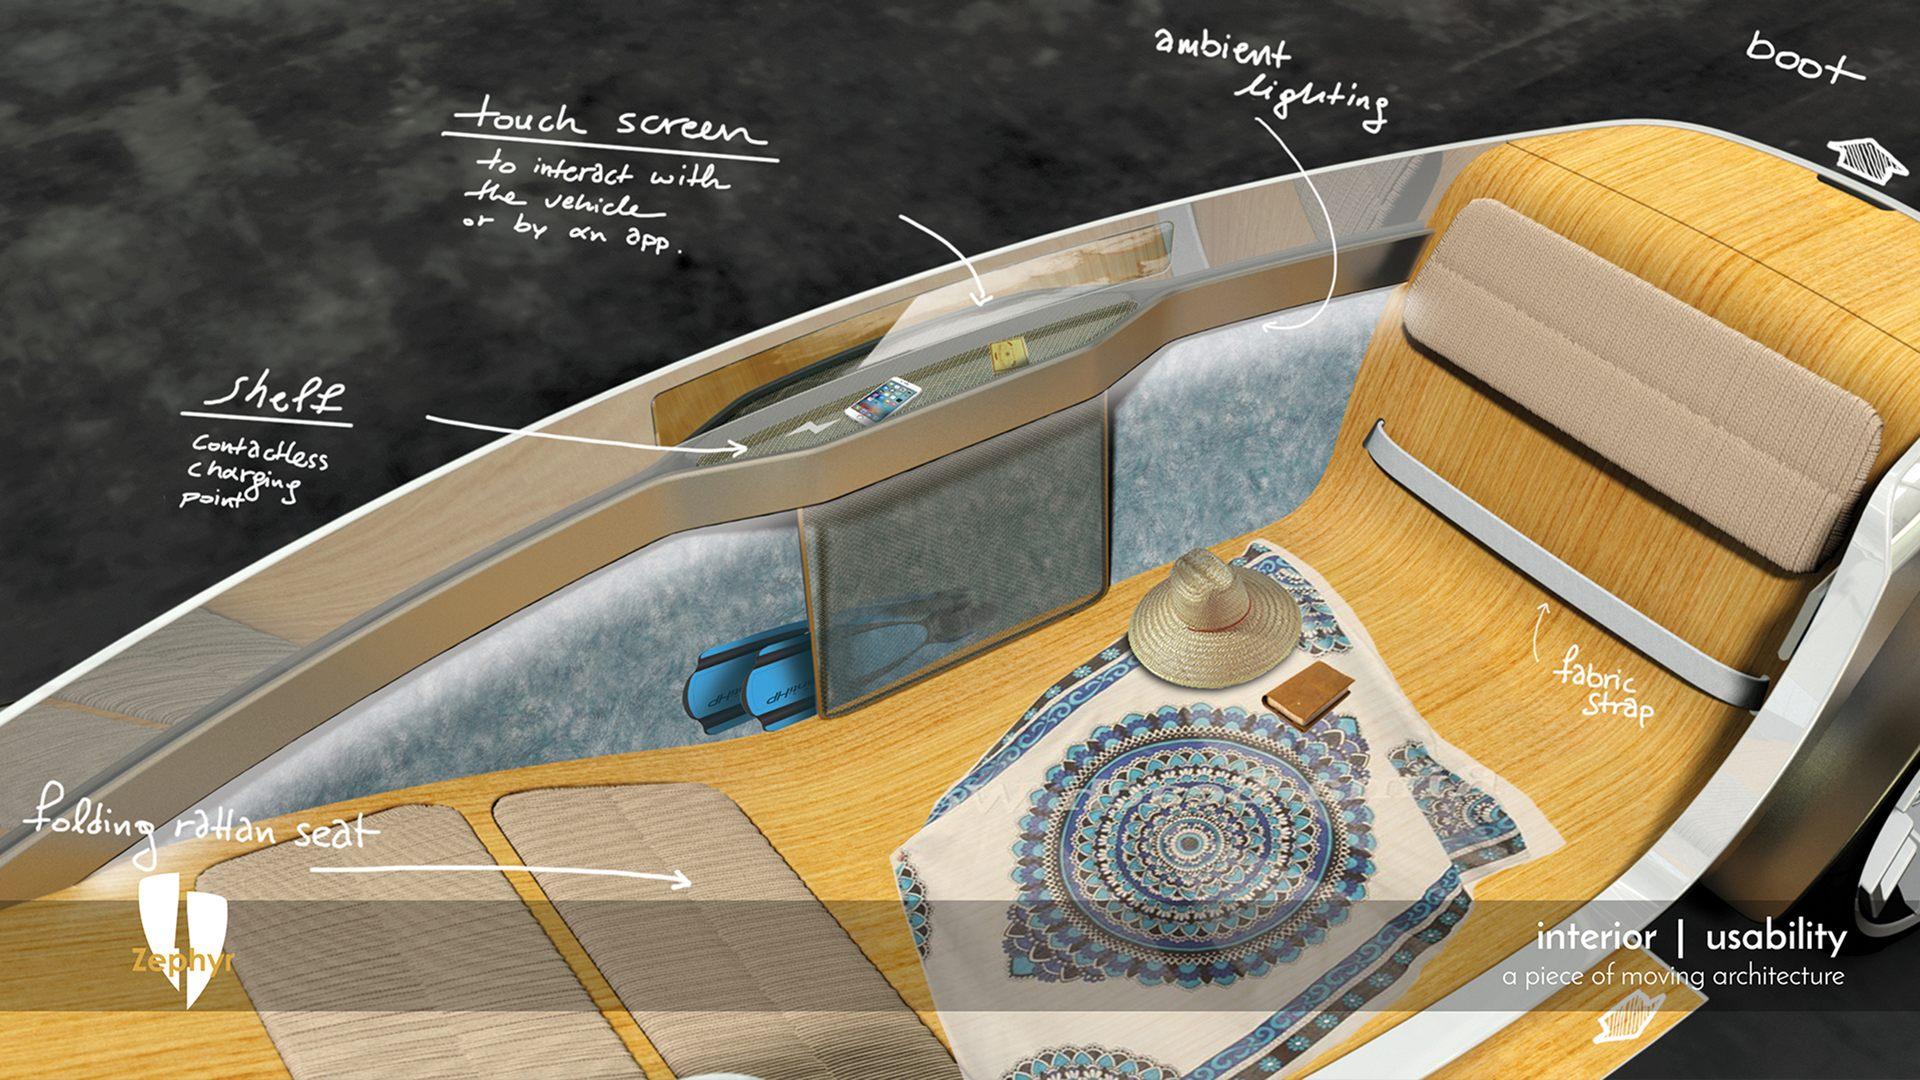 Zephyr - Flexible interior